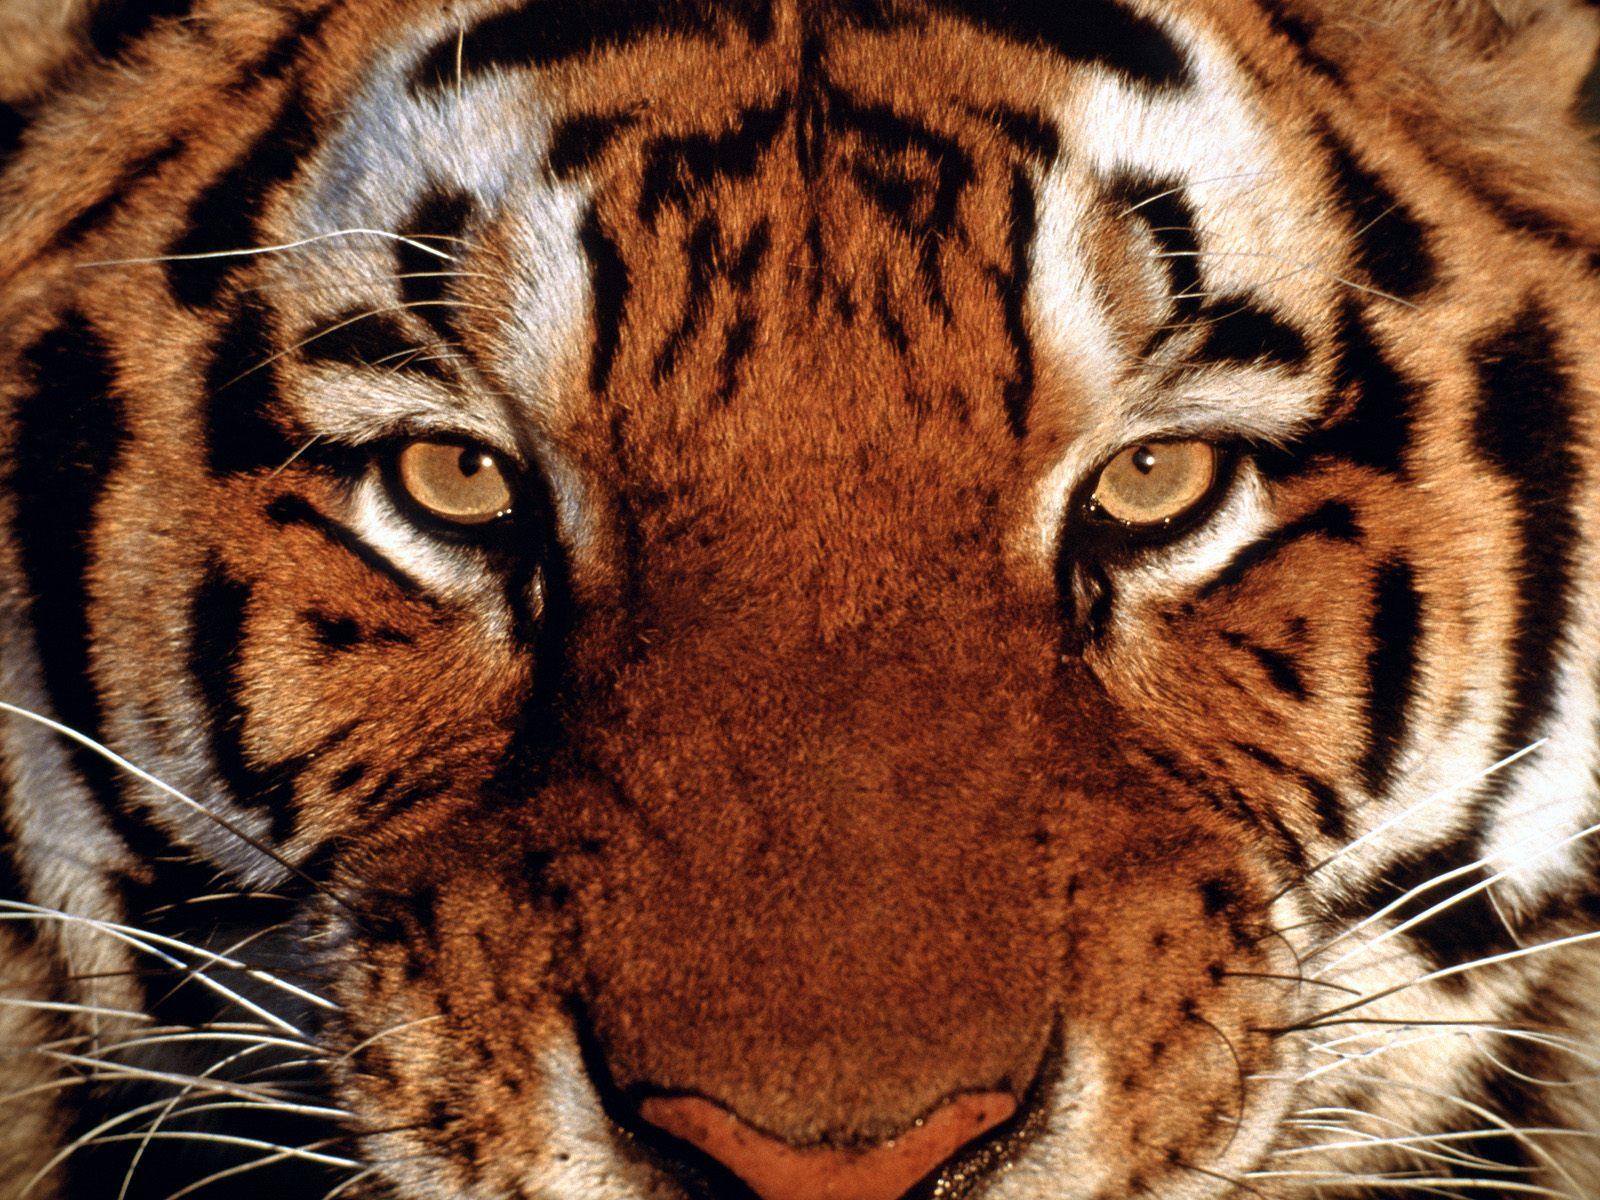 http://1.bp.blogspot.com/-6RtOz2a1UV8/TzF7Vm8MEVI/AAAAAAAAAp8/ohN6g33AzZo/s1600/eye-tiger.jpg